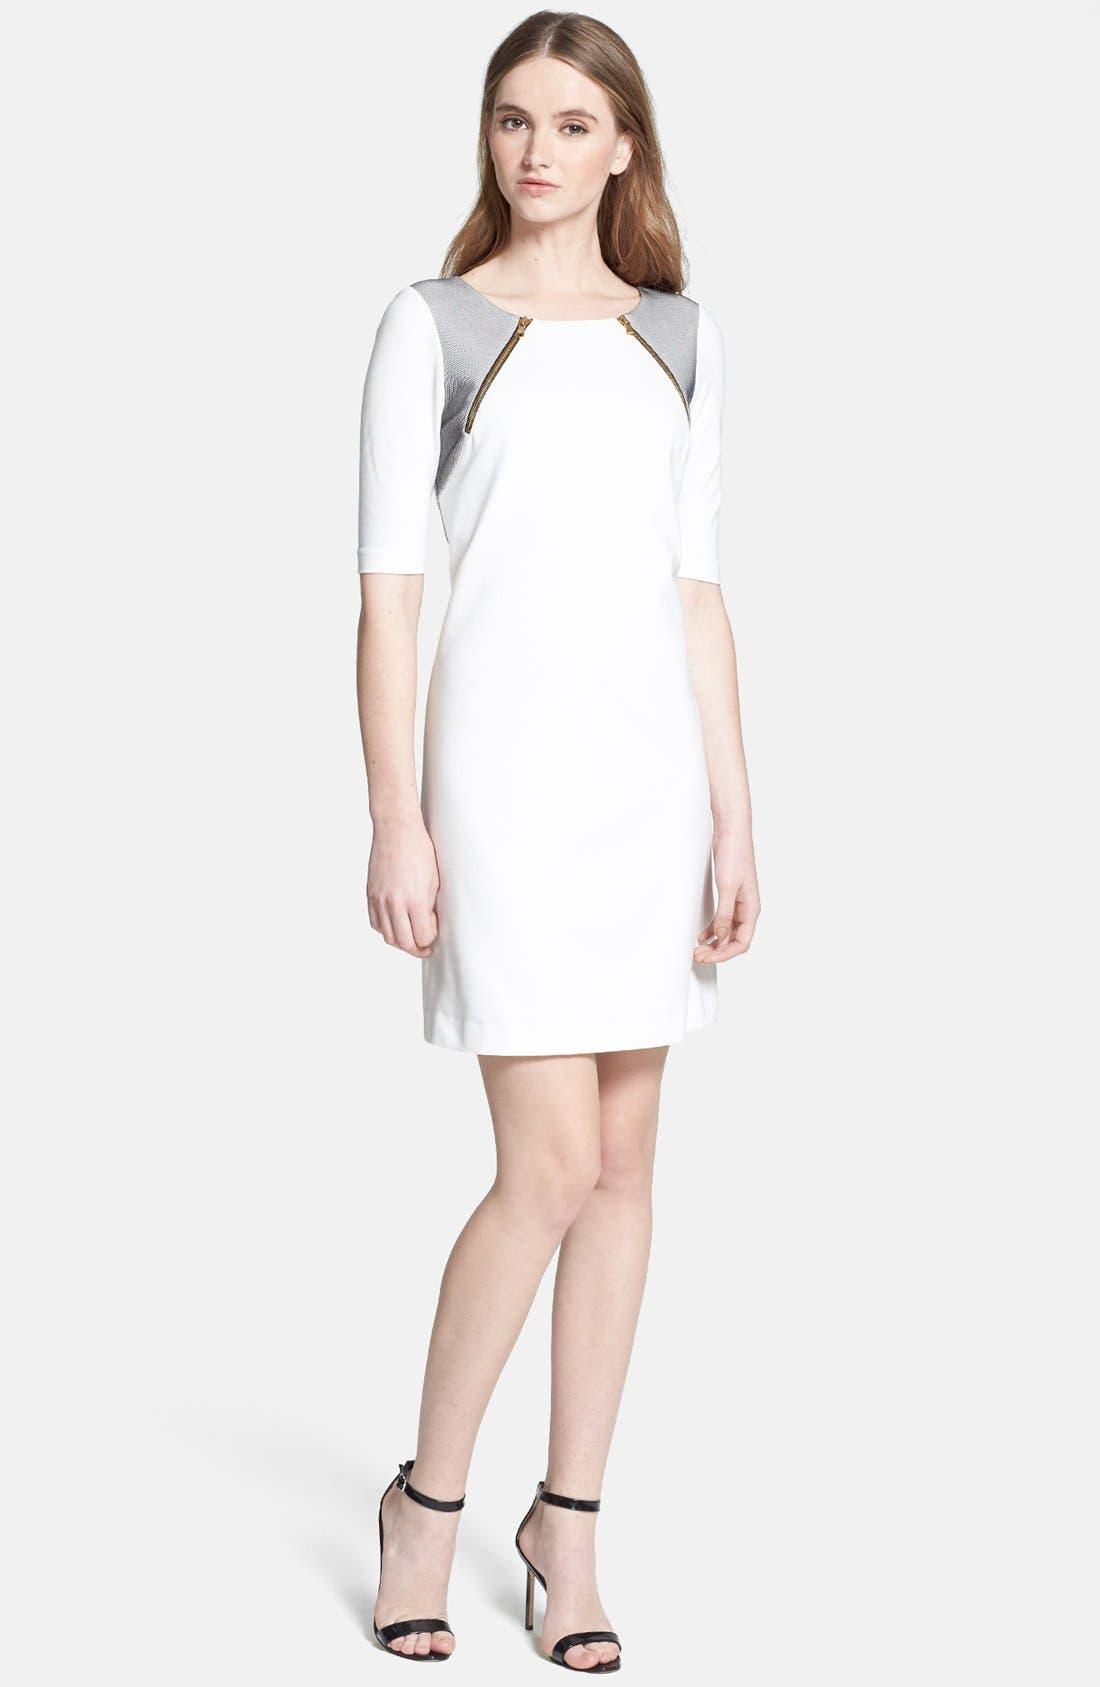 Alternate Image 1 Selected - Trina Turk 'Milena' Mesh Panel Ponte Dress